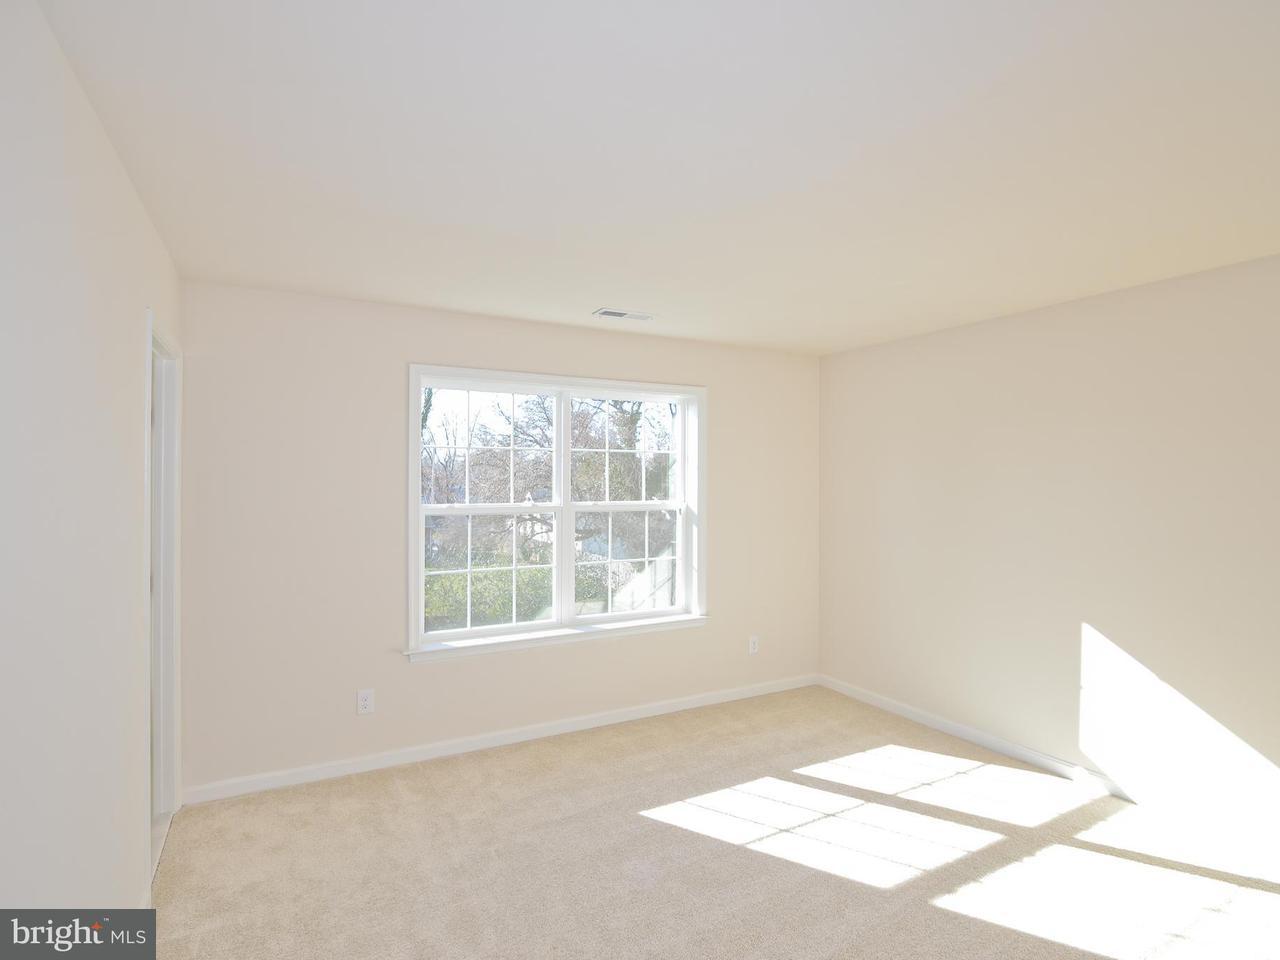 Additional photo for property listing at 9042 Sudley Rd #16a 9042 Sudley Rd #16a Manassas, Виргиния 20110 Соединенные Штаты